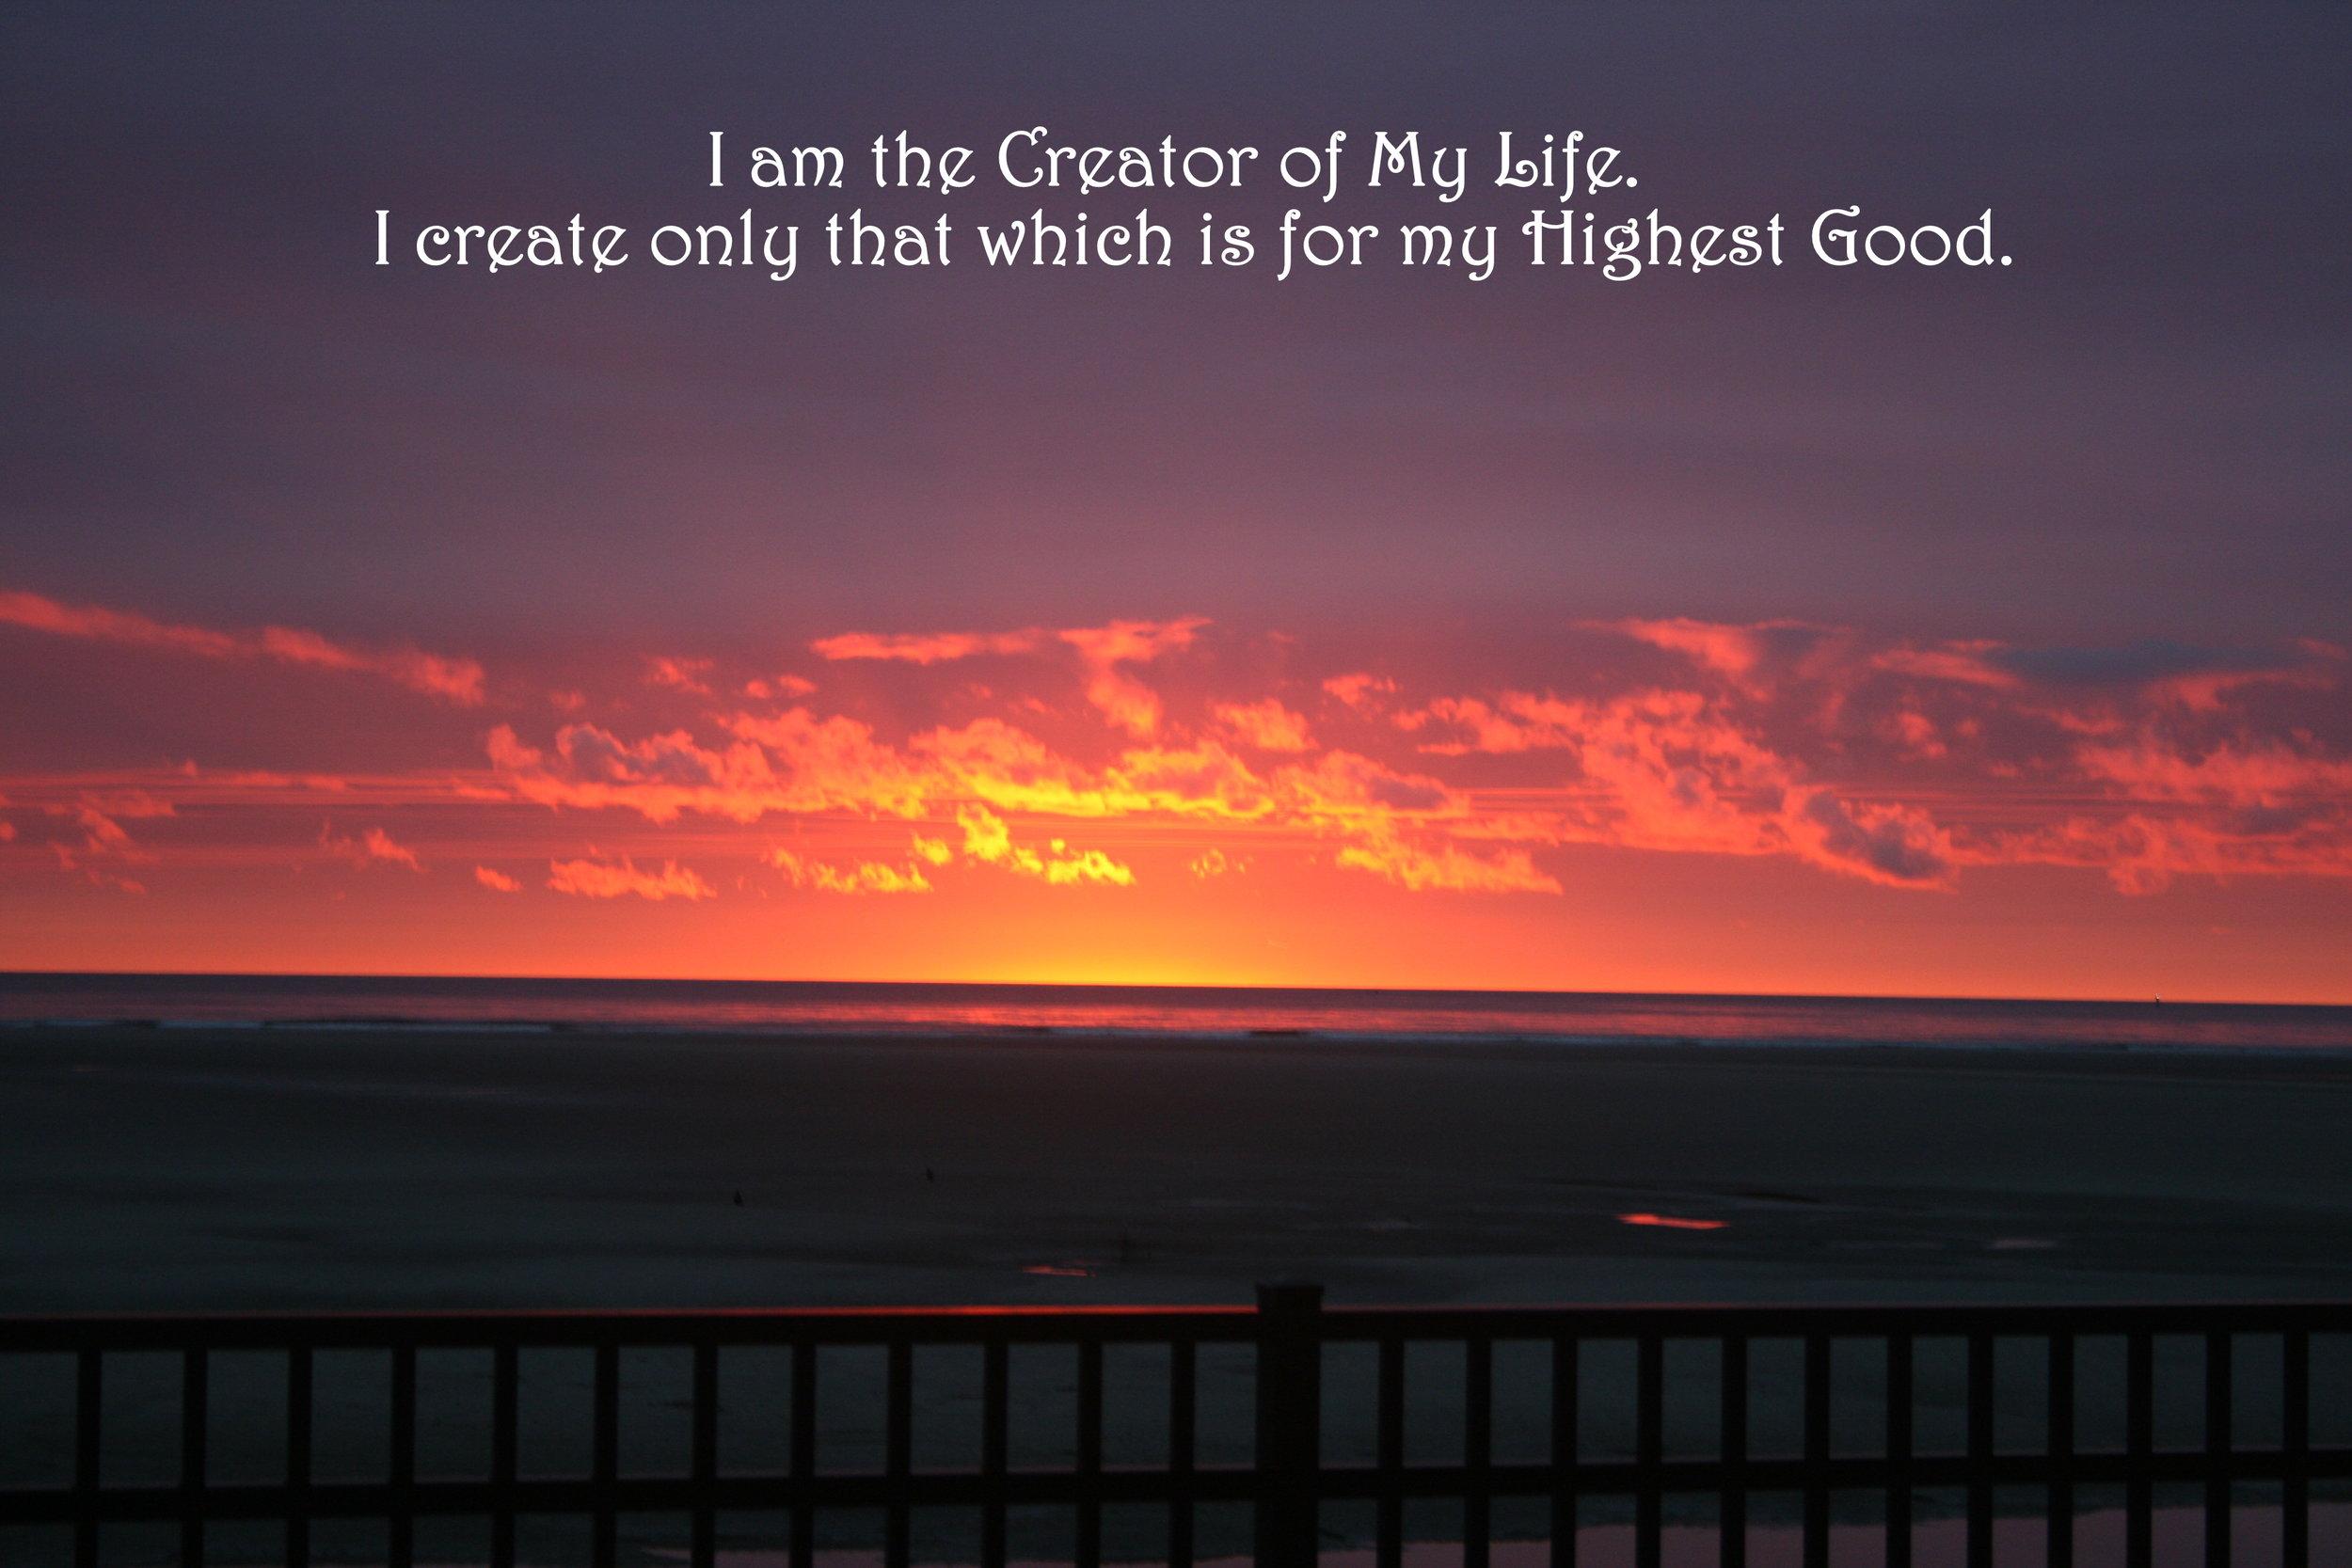 Sunrise over railing_Creator of life, highest good.jpg